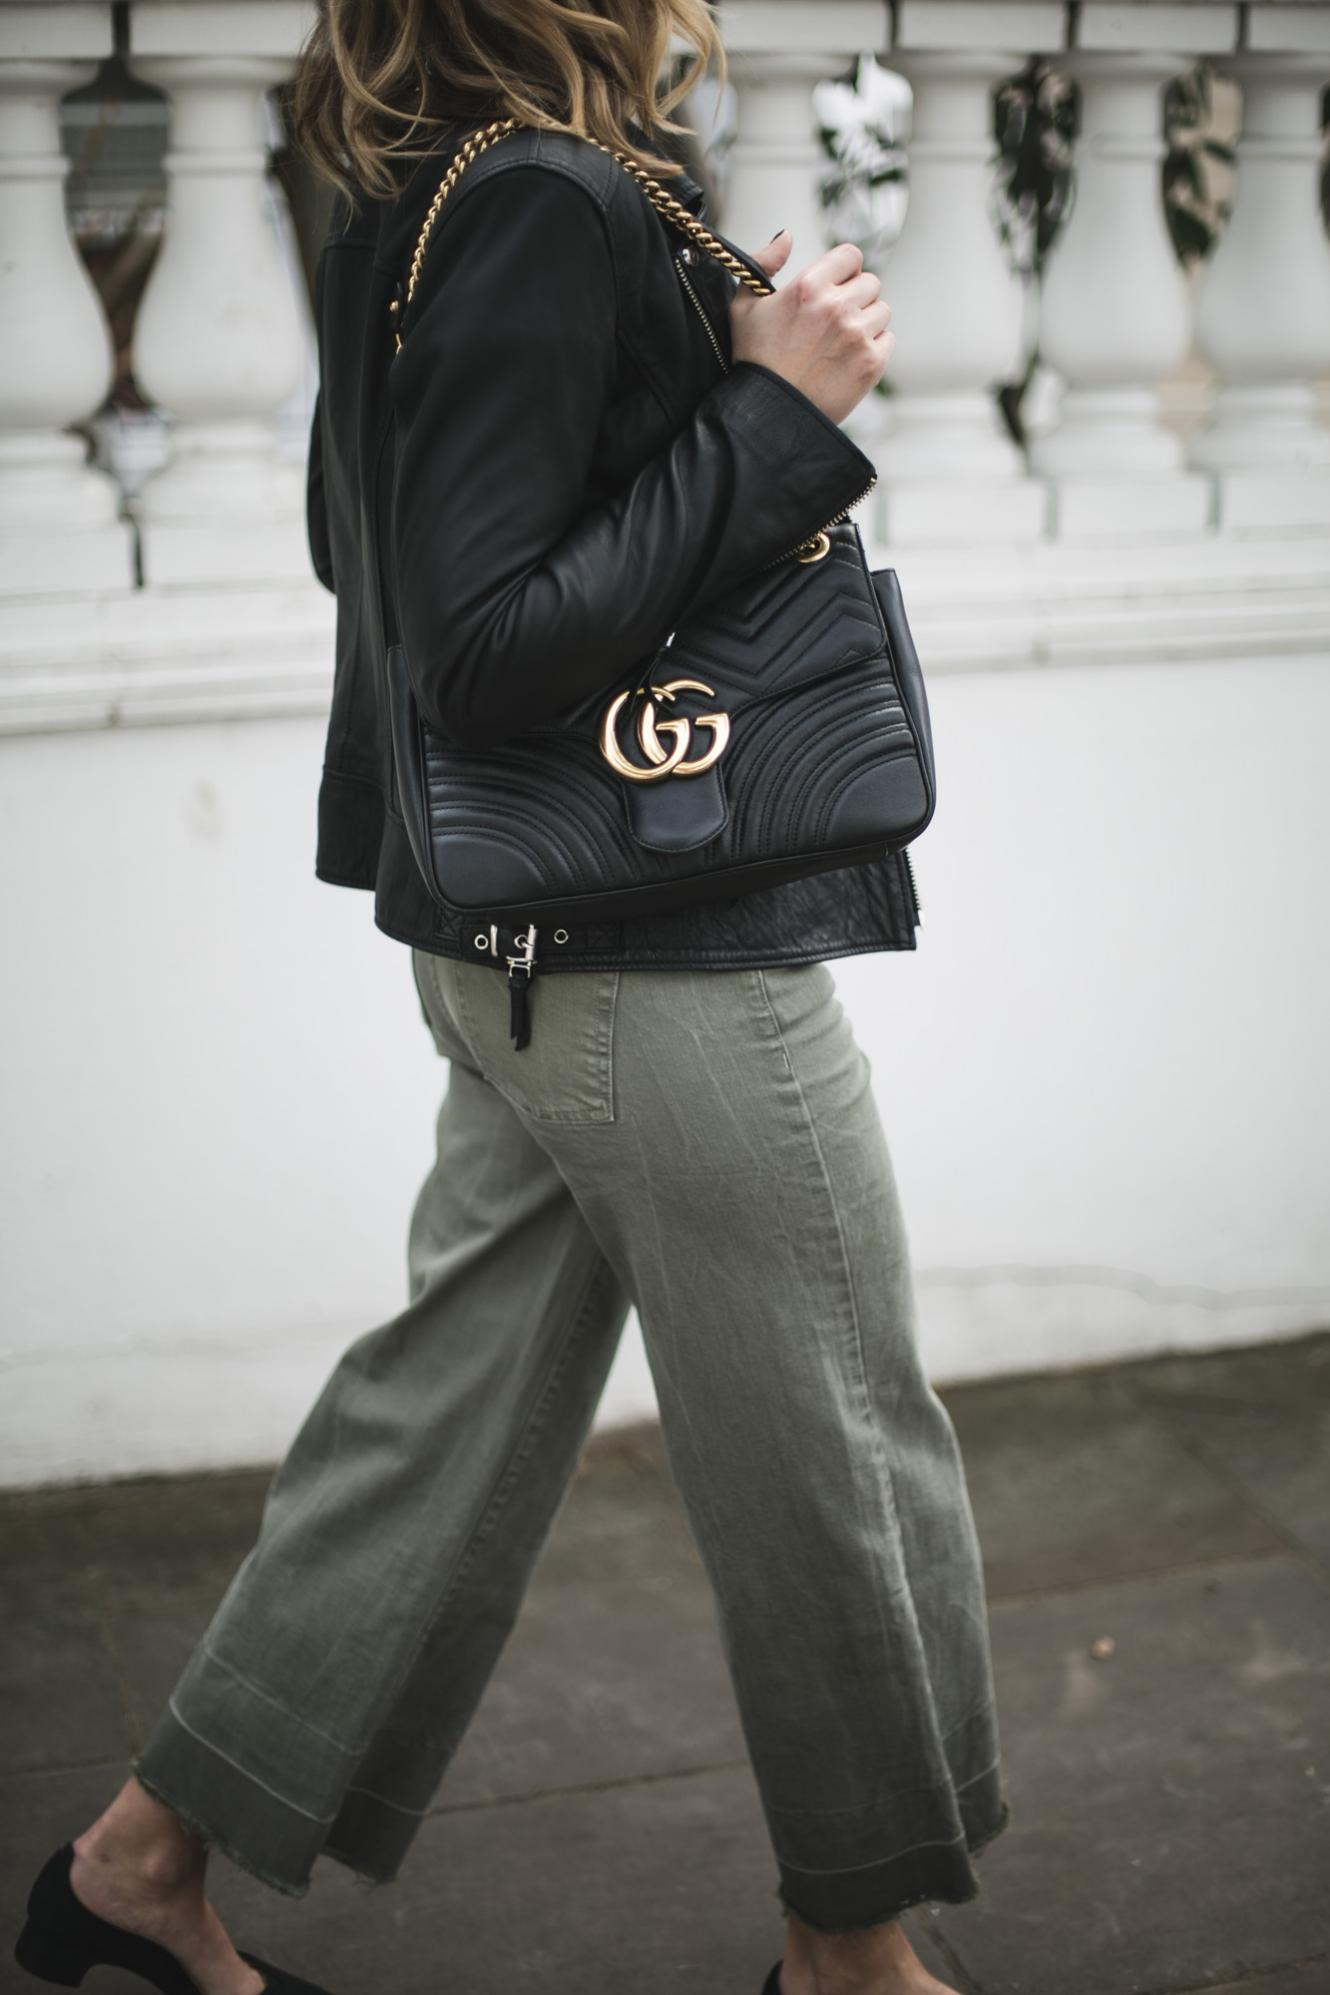 black biker jacket, Gucci medium black leather Marmont bag, wide leg khaki jeans trousers